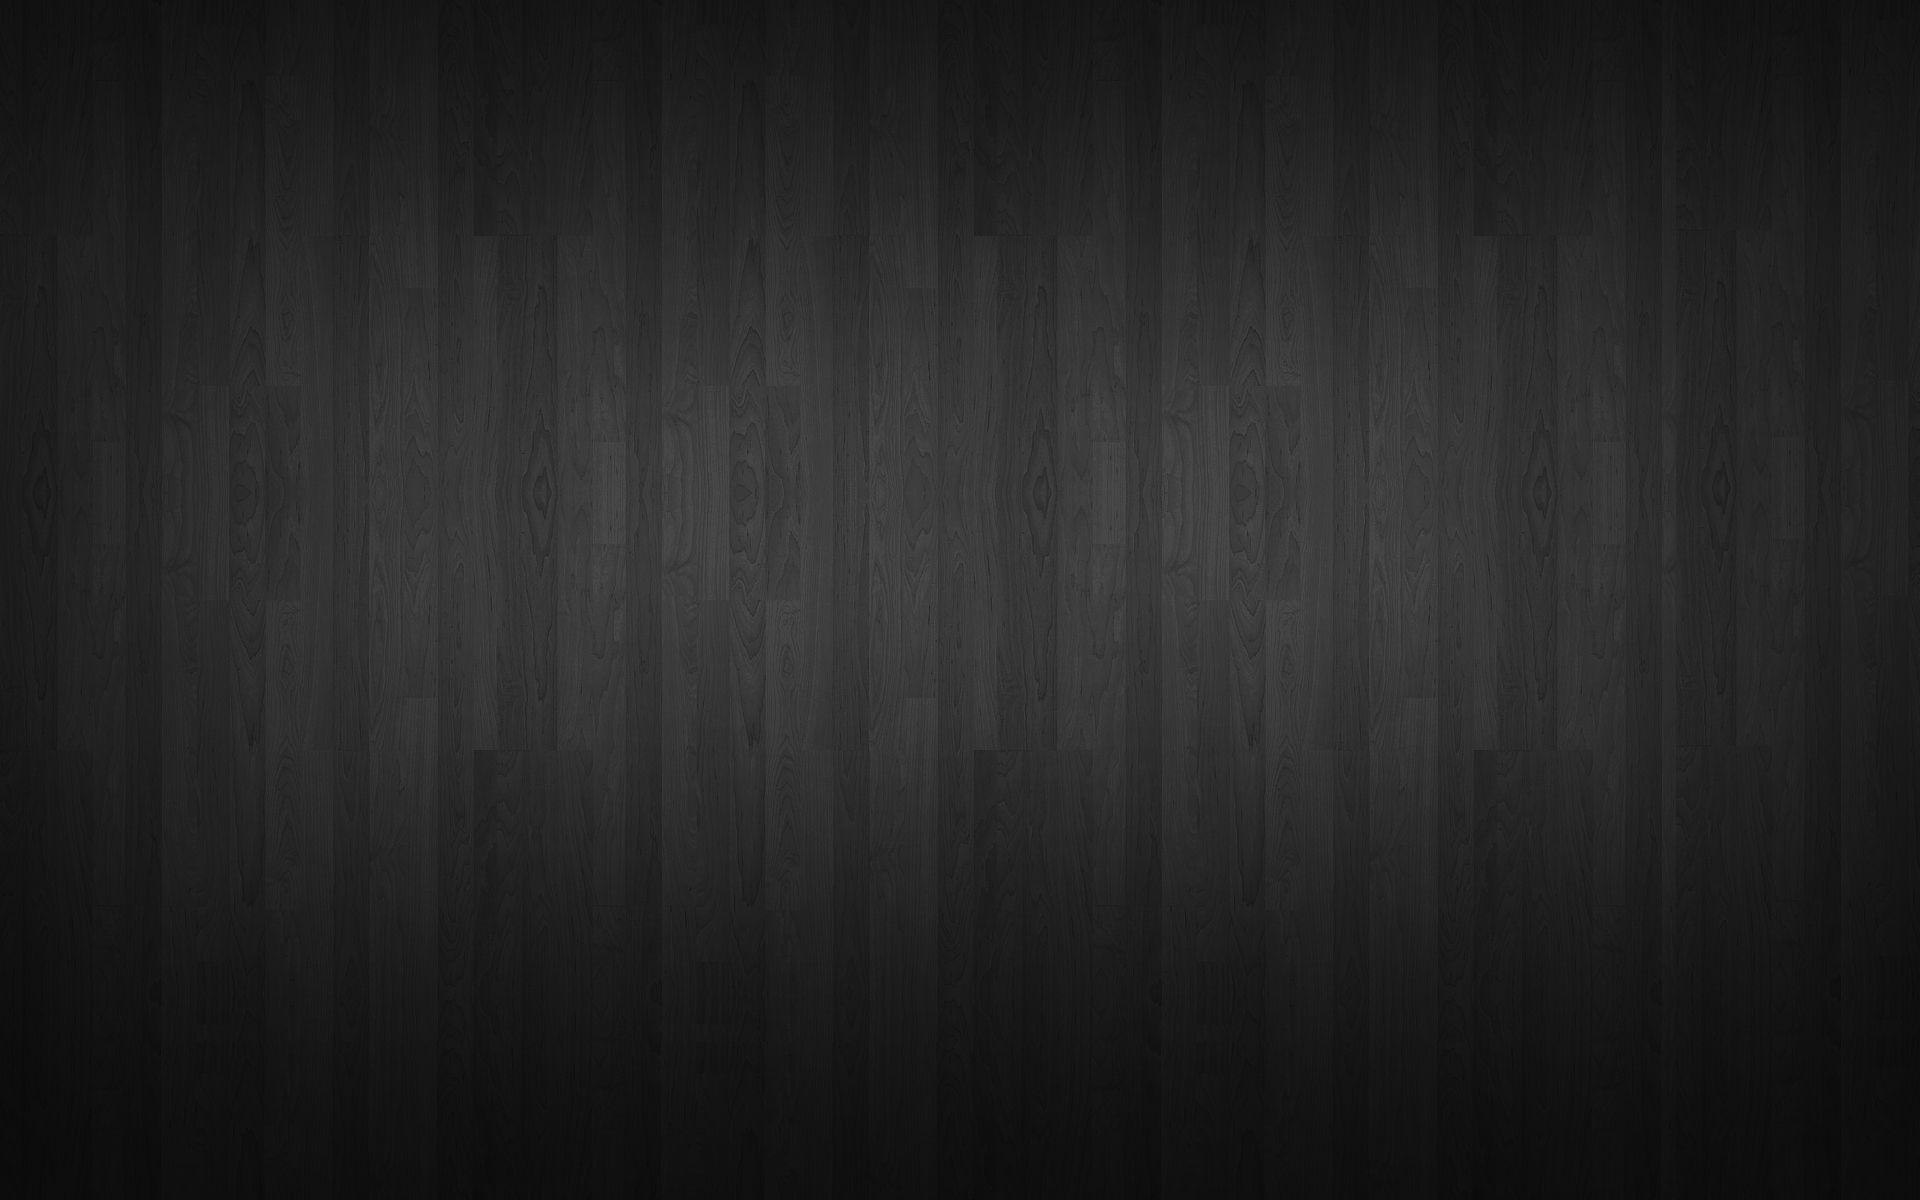 Background Design Layout Animated Web Layout9 Layer Tutorials Wood Wallpaper Dark Wood Texture Black Wallpaper